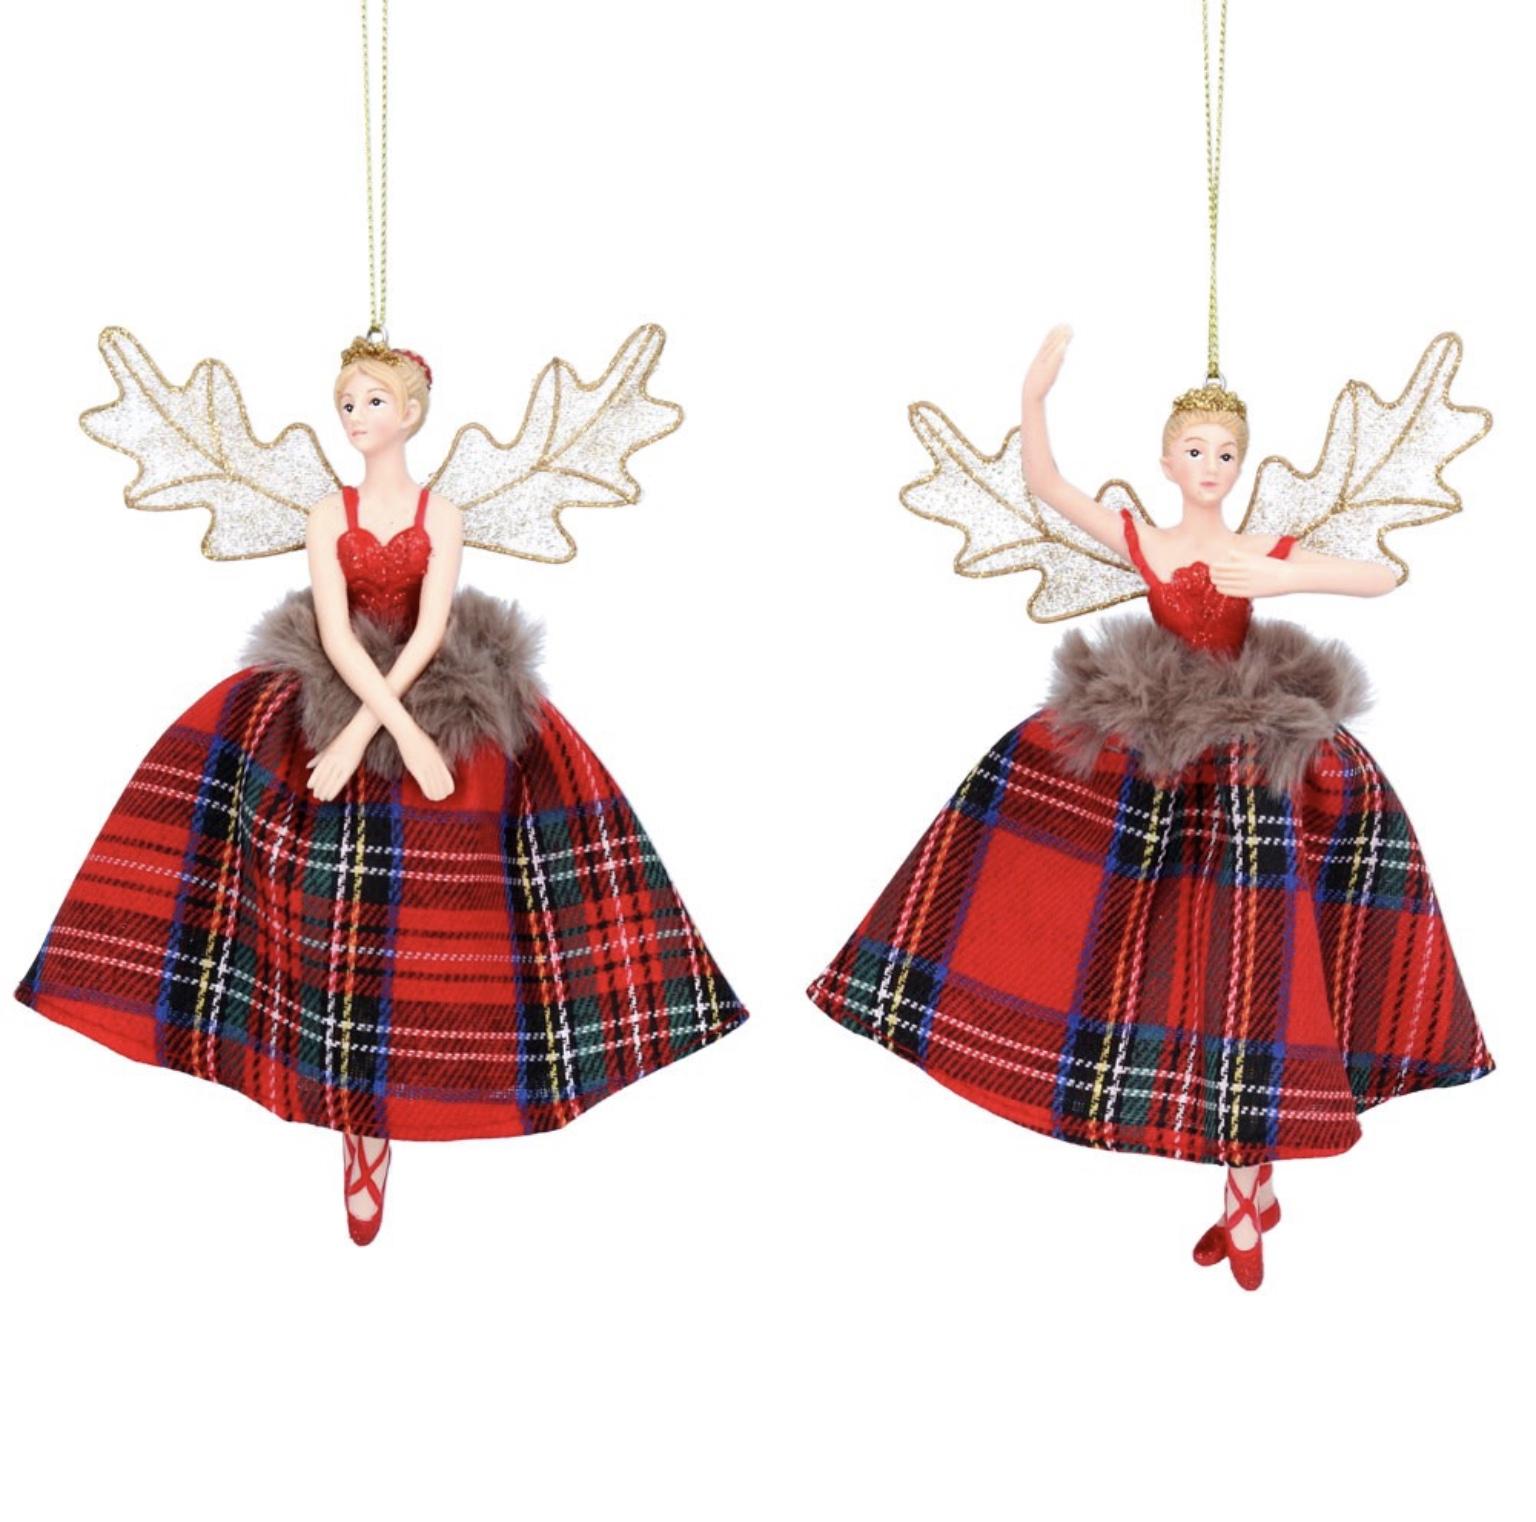 Tartan fairies